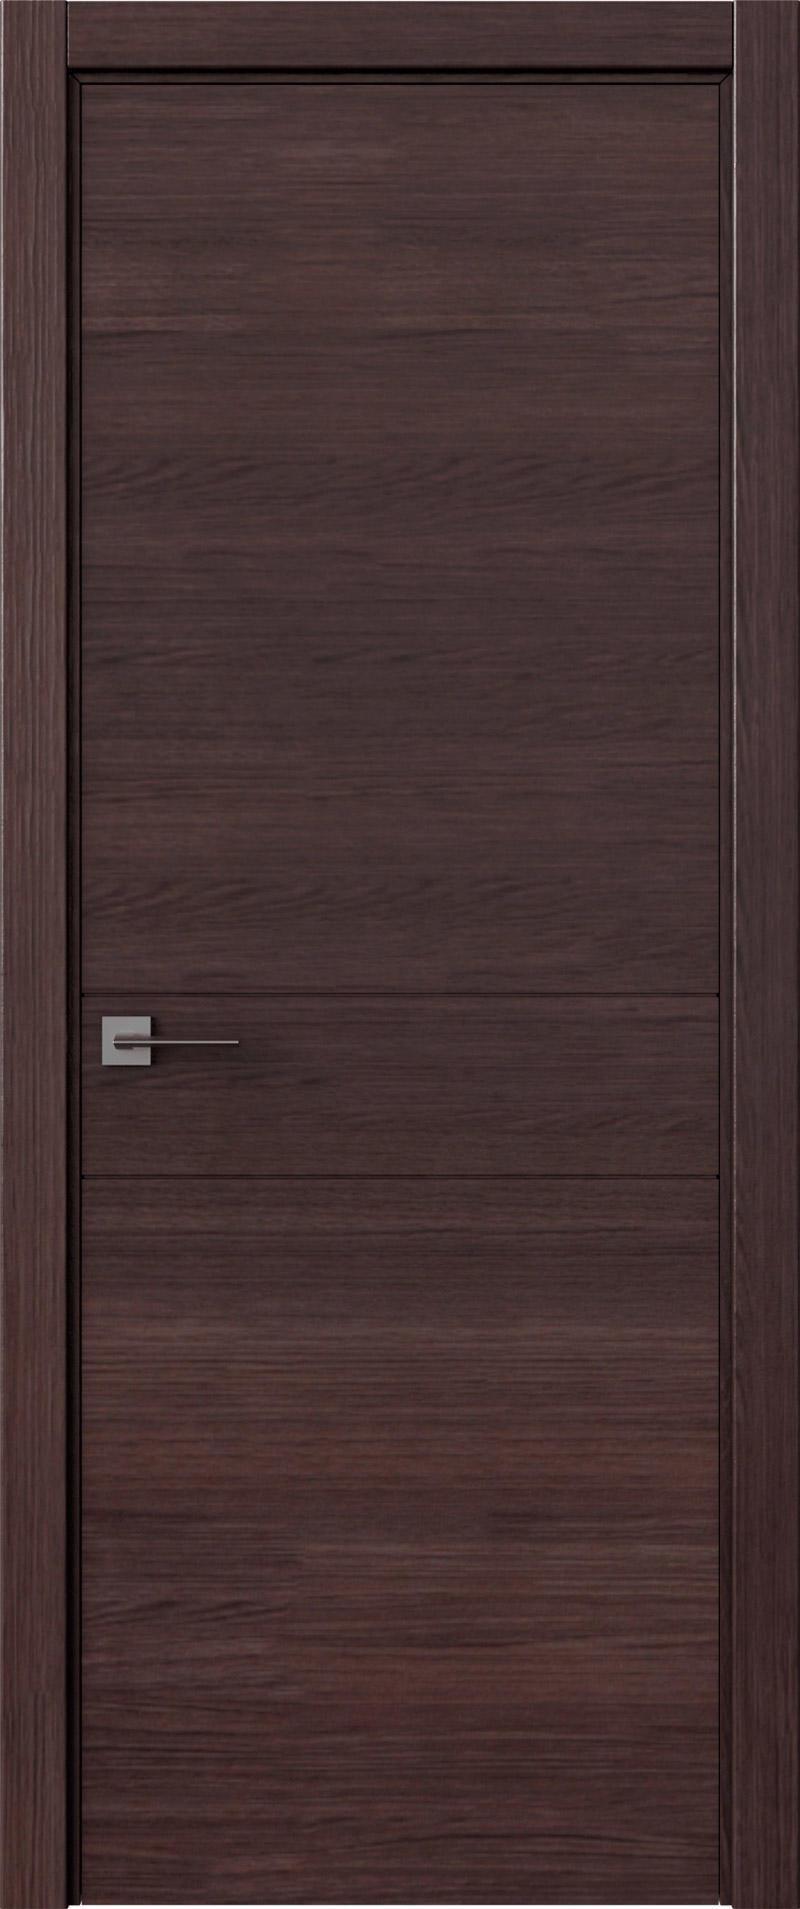 Tivoli И-2 цвет - Венге Нуар Без стекла (ДГ)